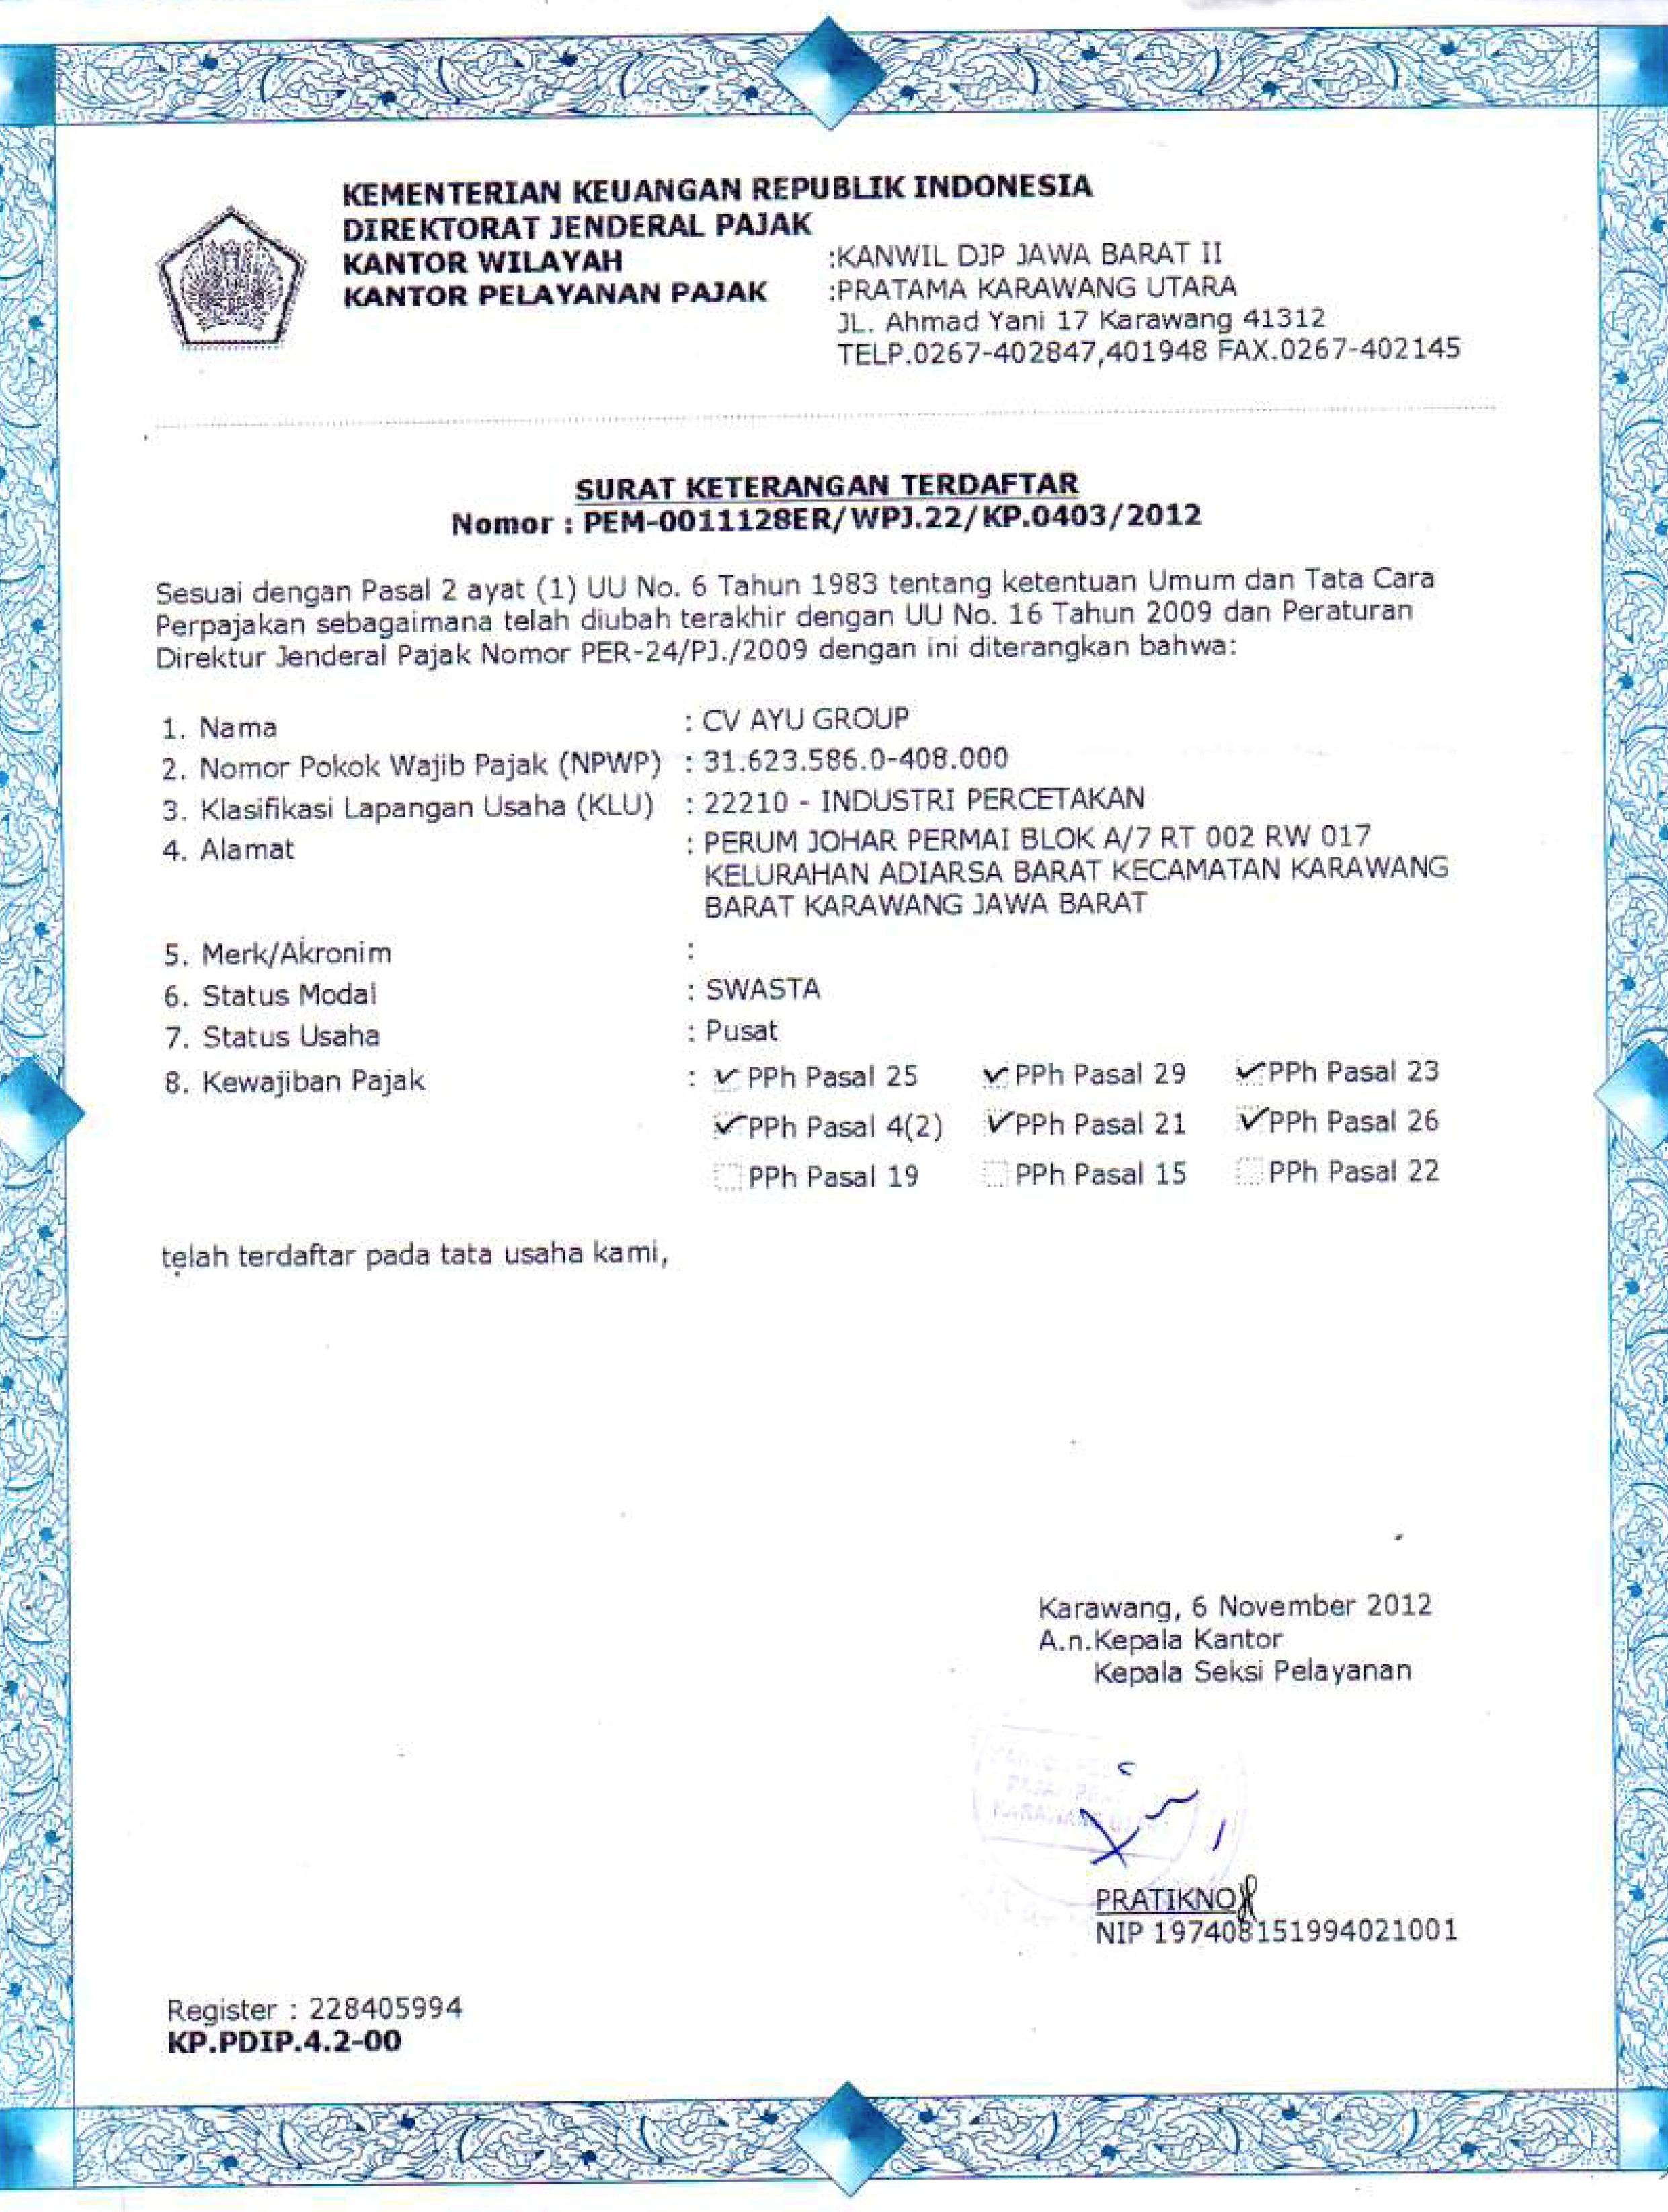 Dokumen Legalitas CV Ayu Group Terdaftar Pajak 2